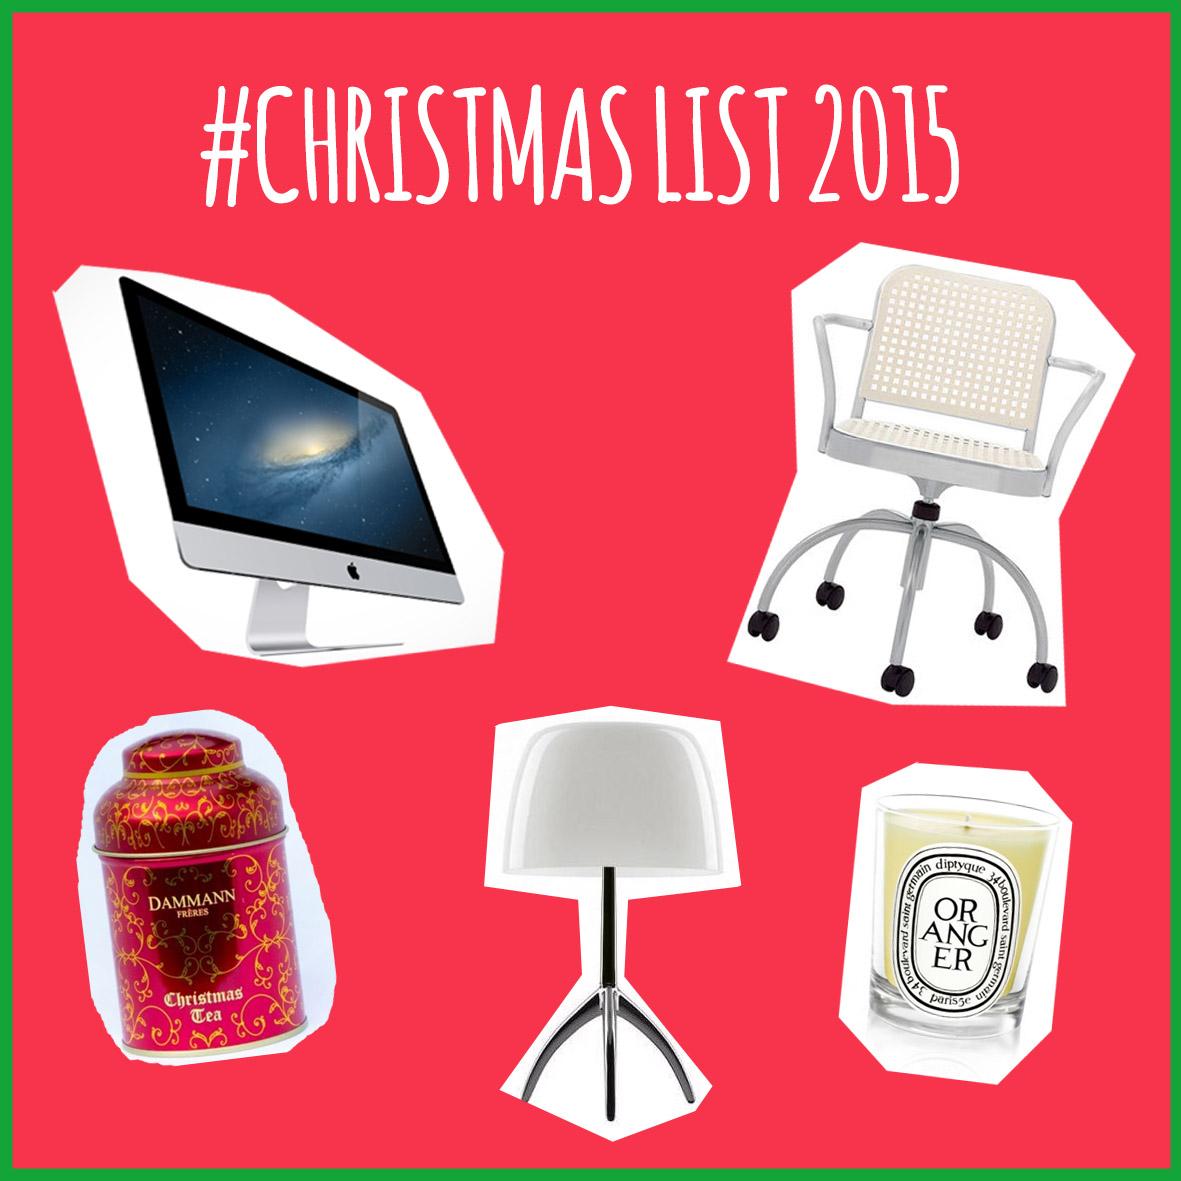 Christmas list 2015 Bubbles Com